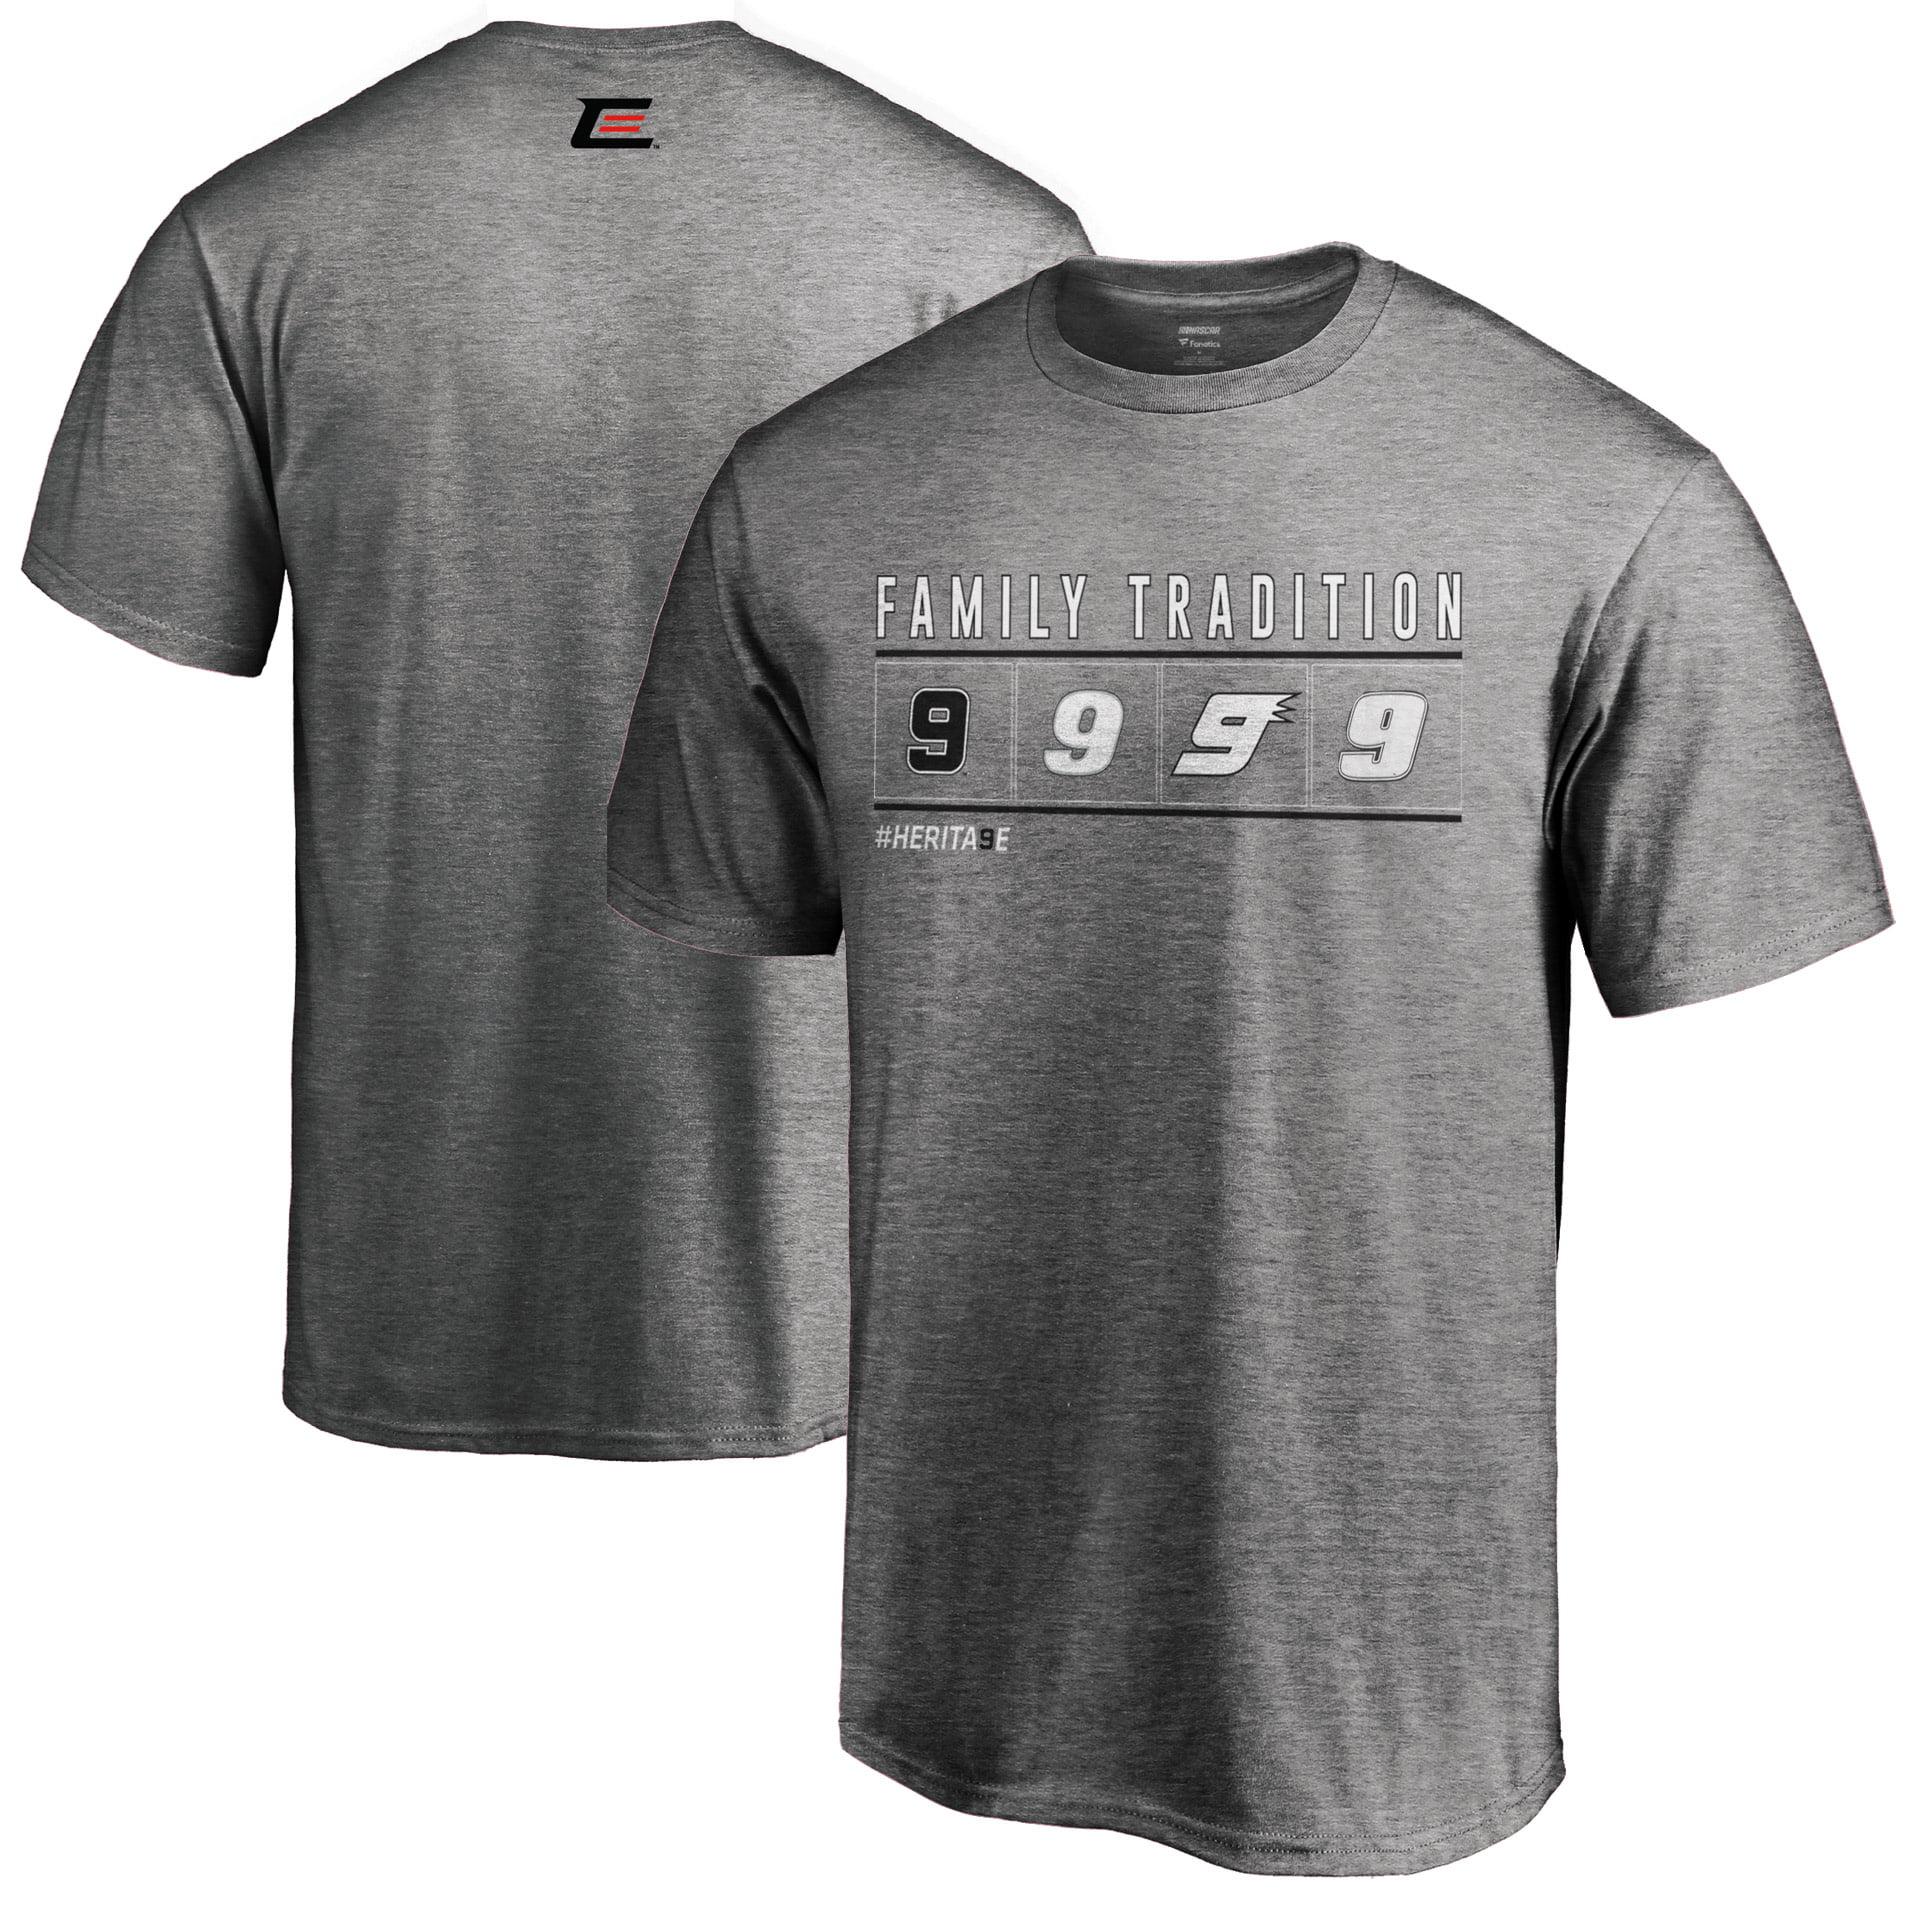 Chase Elliott Fanatics Branded Family Tradition T-Shirt - Gray